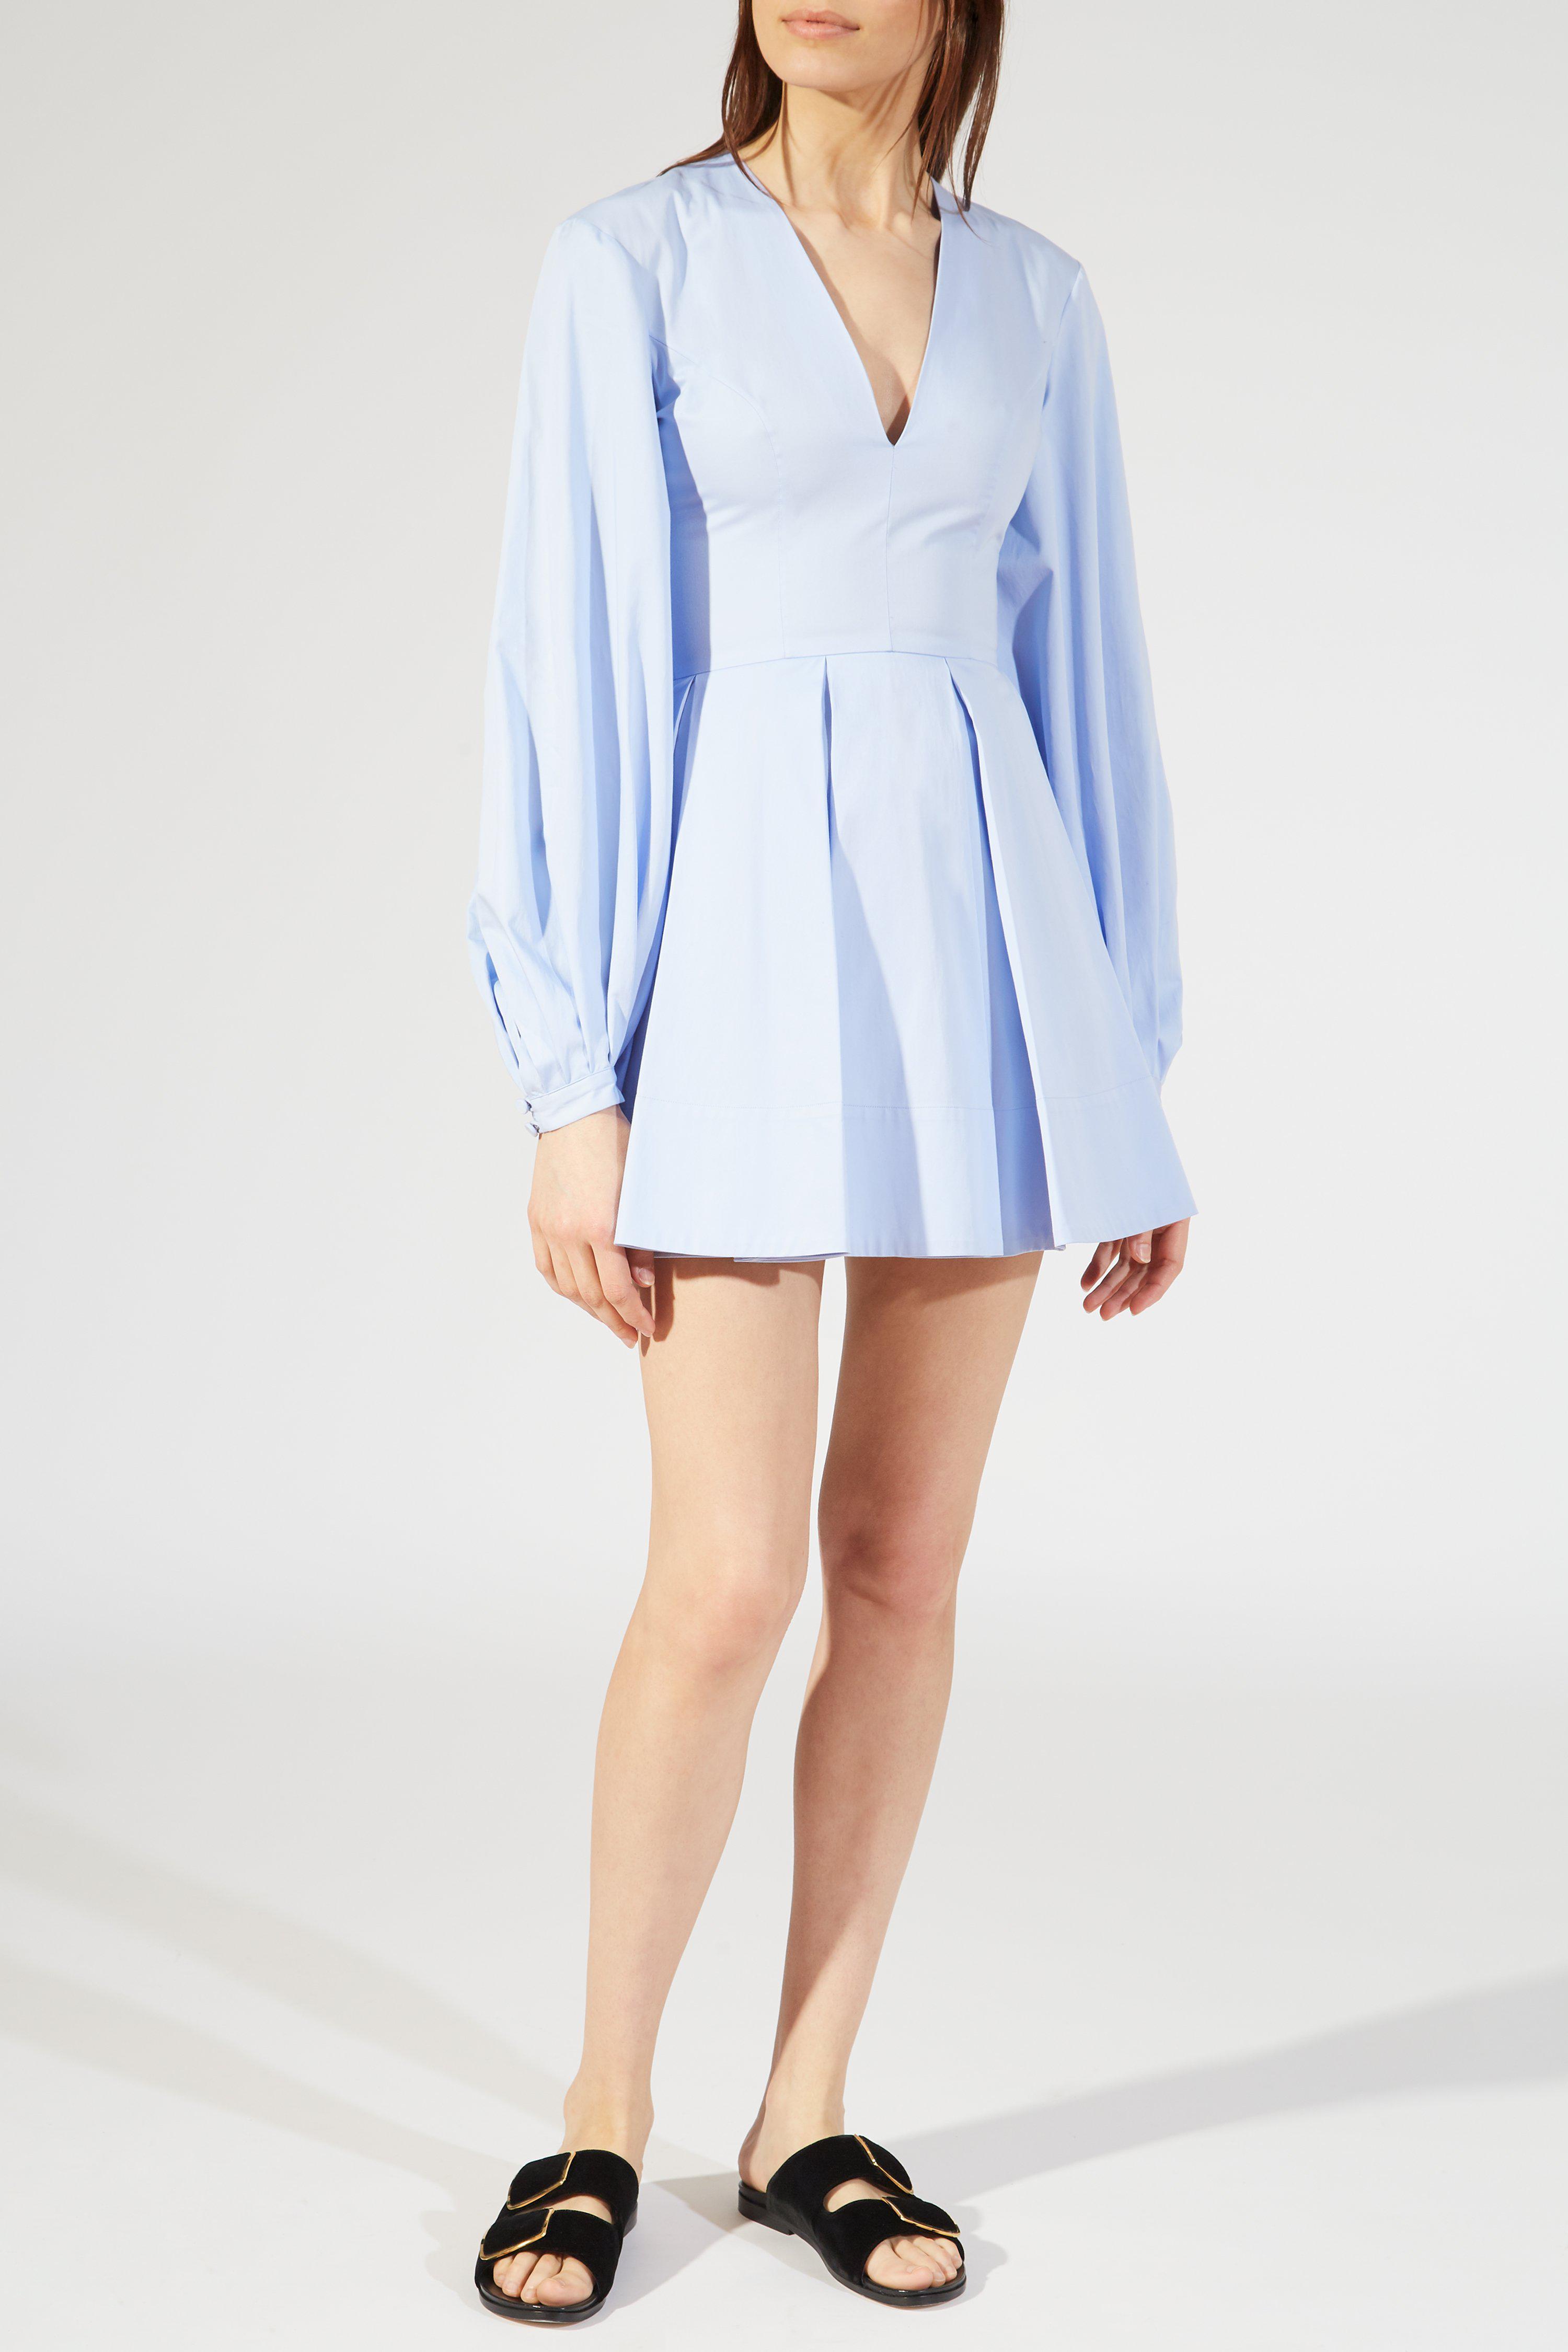 Huge Surprise Cheap Online Free Shipping Fashionable Denise dress - Blue Khaite o55vGhYP